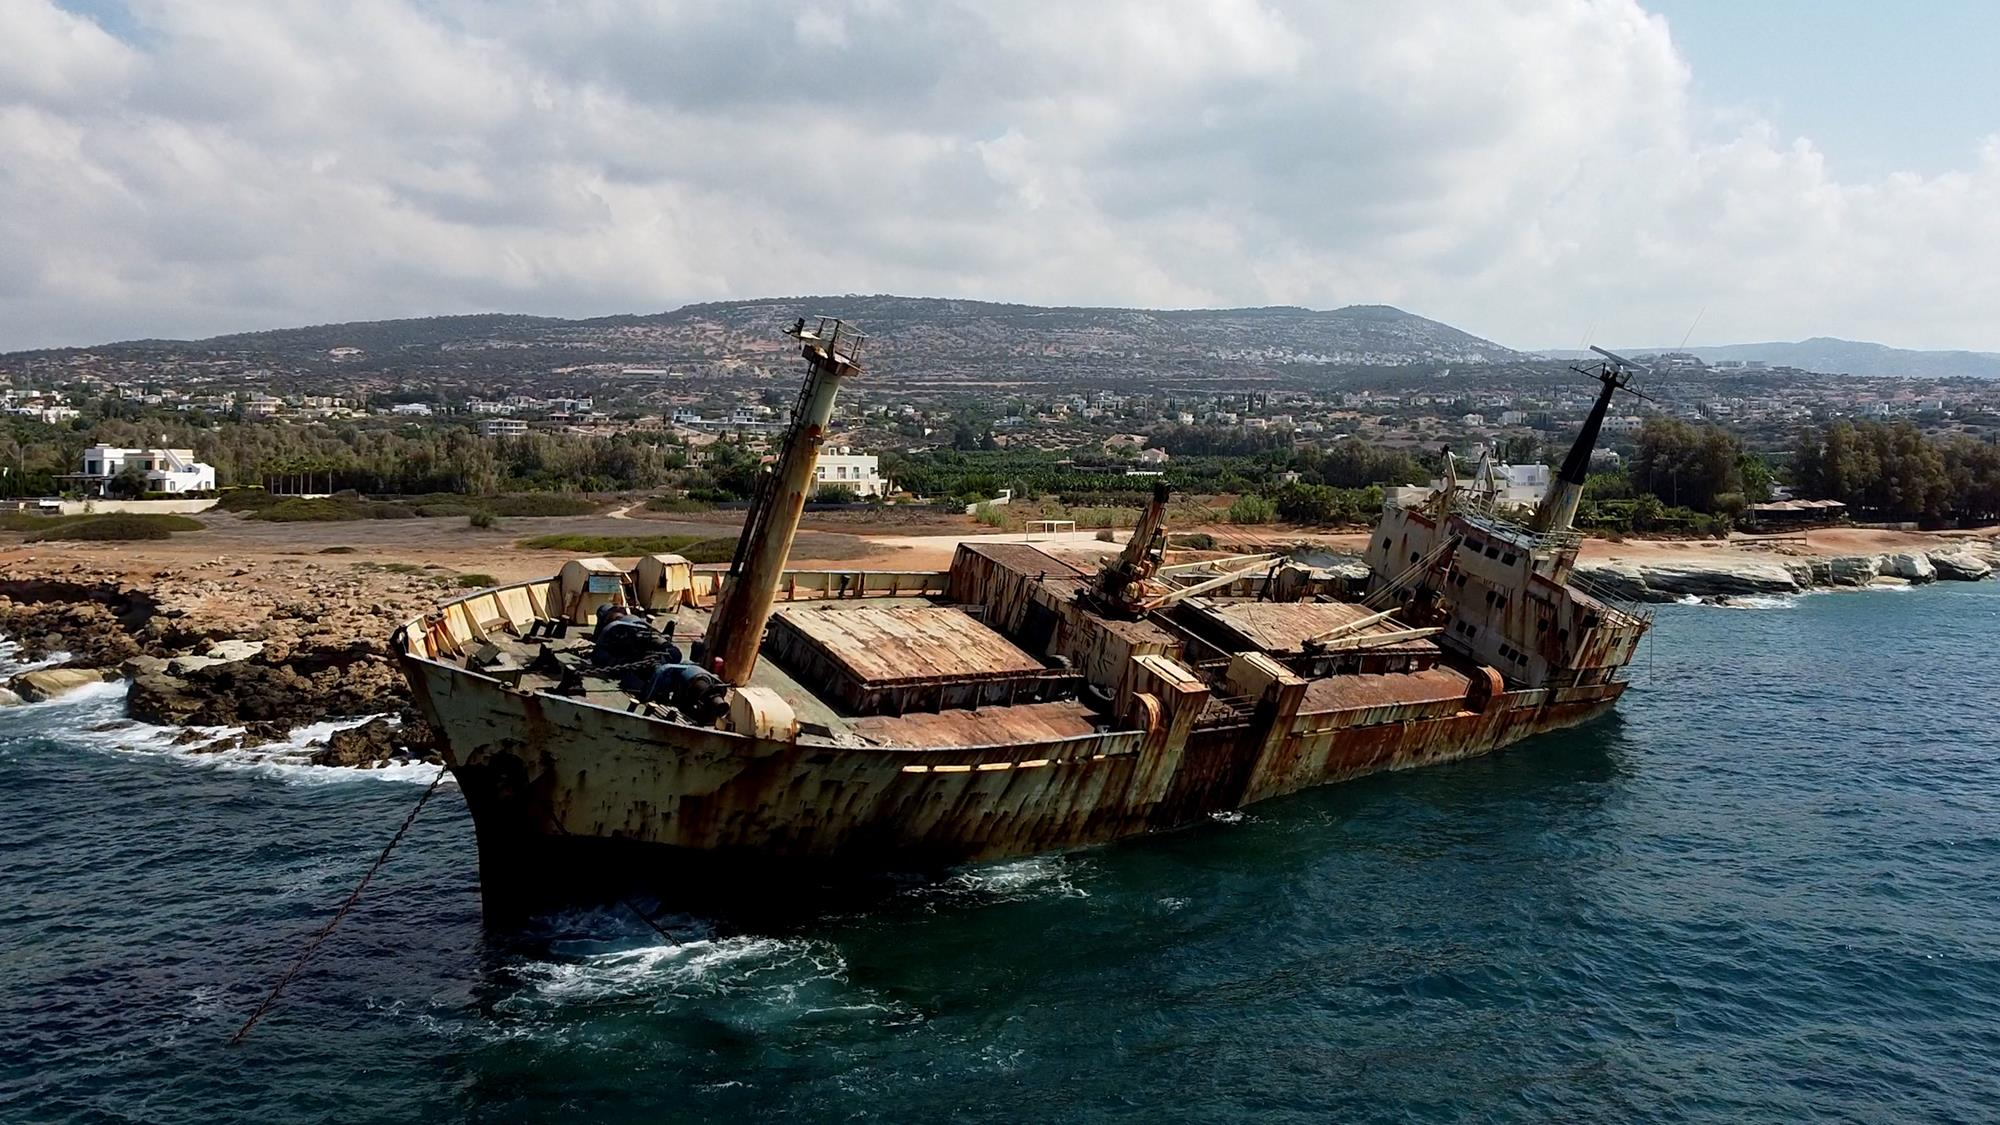 Zypern 2021 (Drohnenvideo)